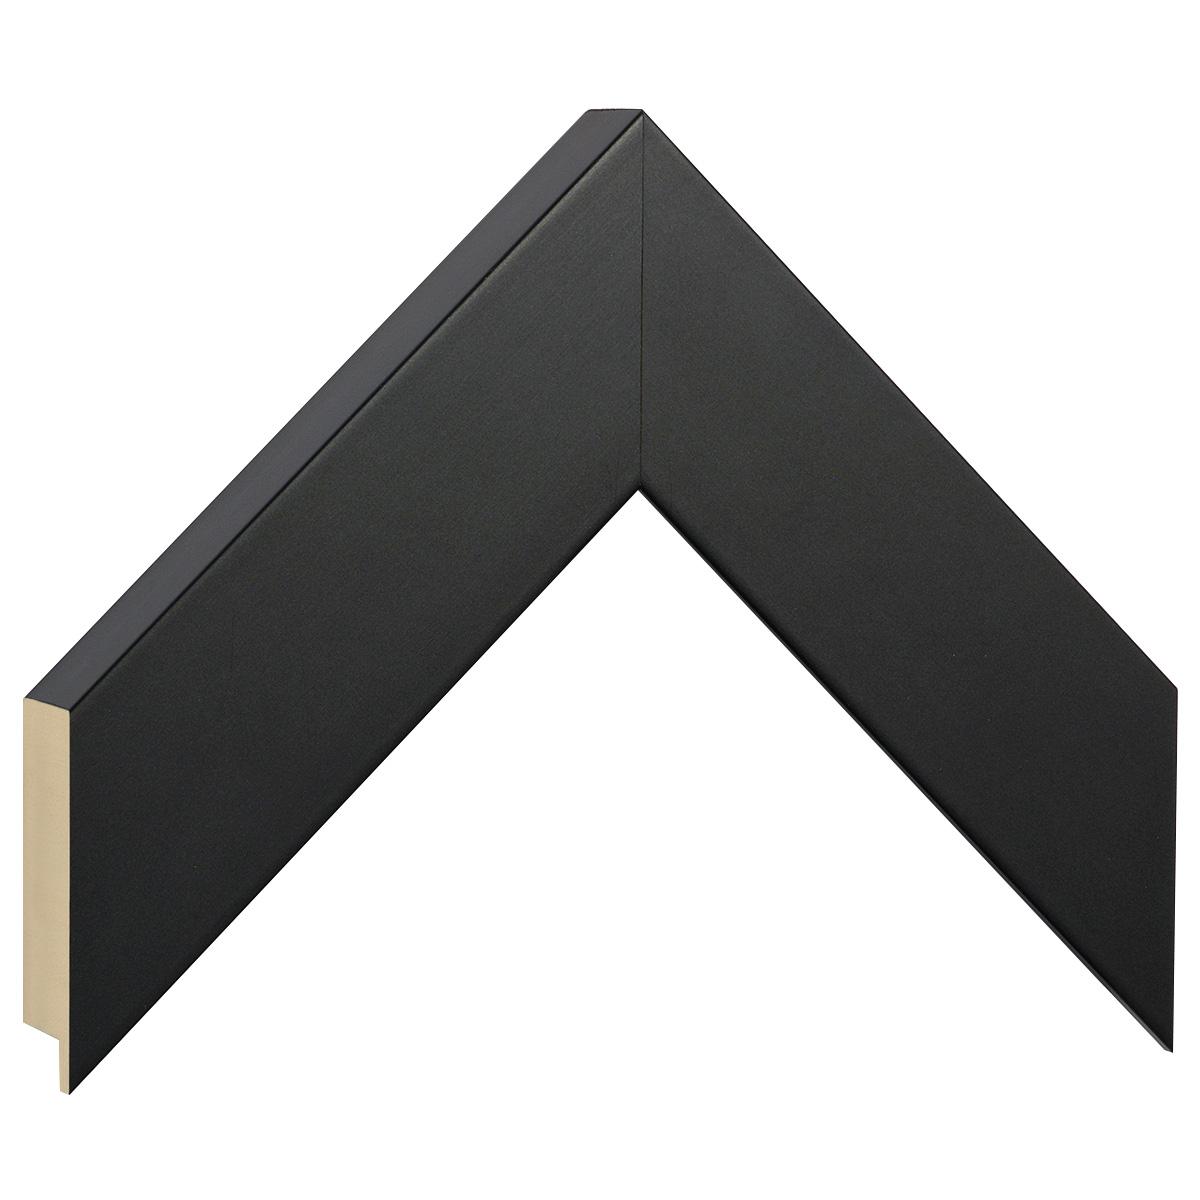 Moulding ayous, width 50mm height 32 - matt black